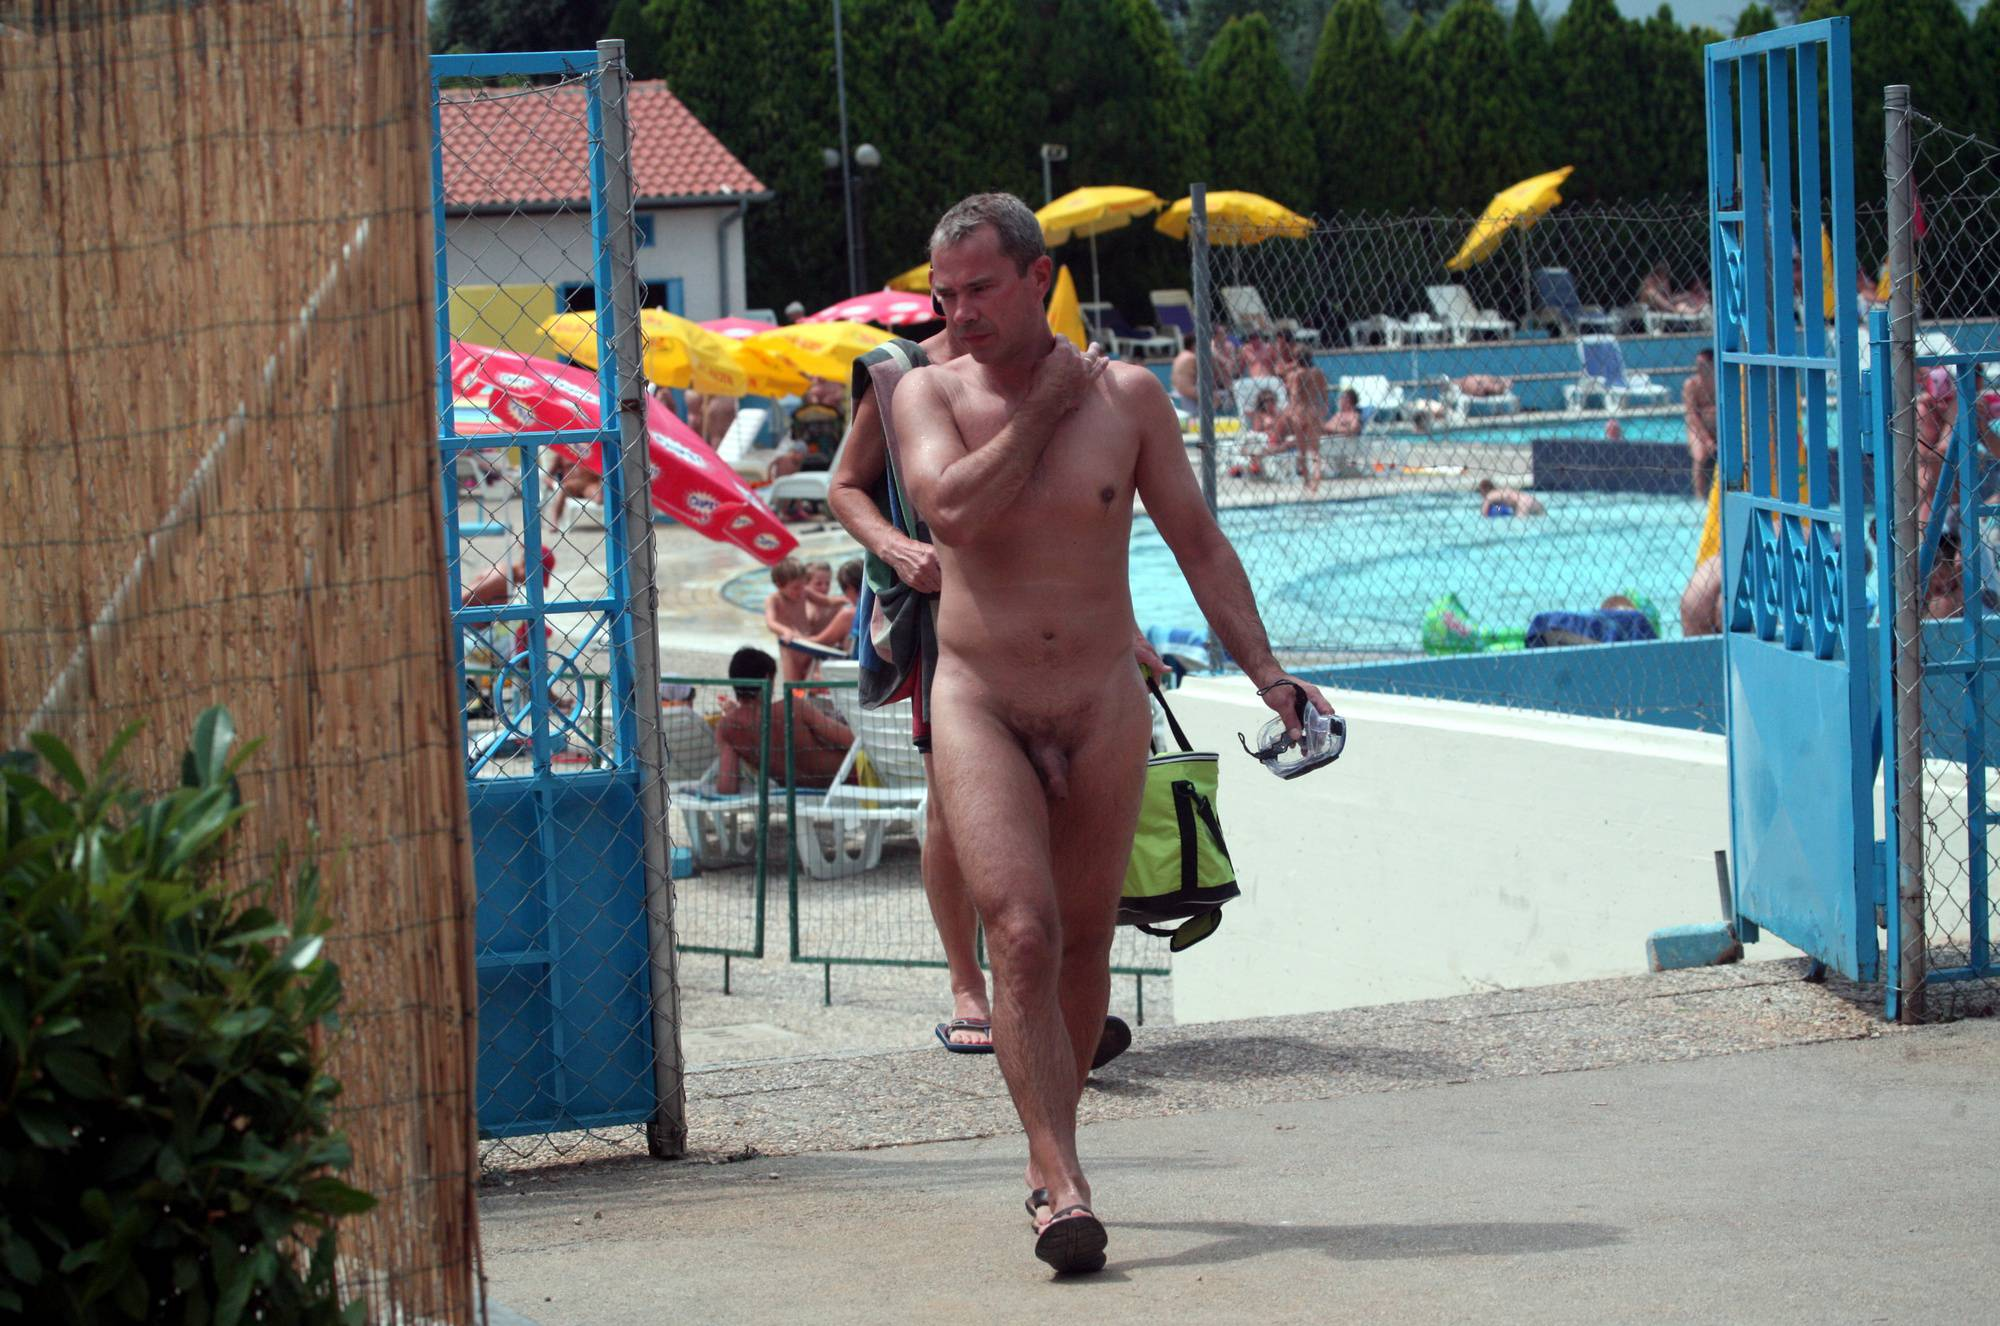 Nudist Pictures Naturist Pool Resort Exits - 1